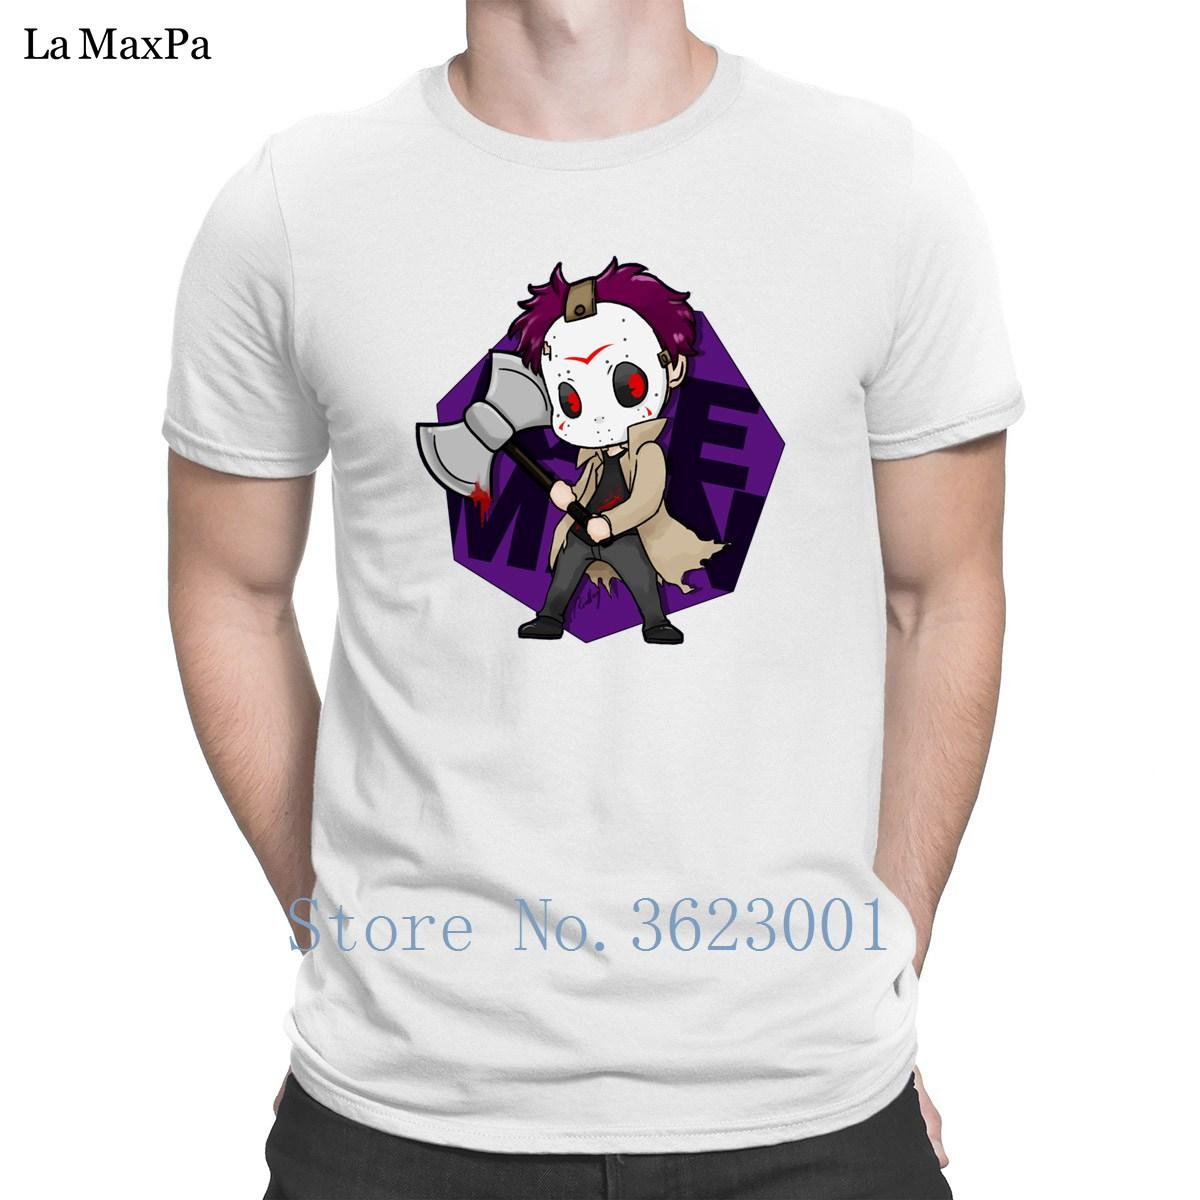 L'uomo con ascia avatar Men T Shirt Umorismo T Shirt carattere Trend Estate Tee Shirt in cotone semplice Mens Cheap divertente casual